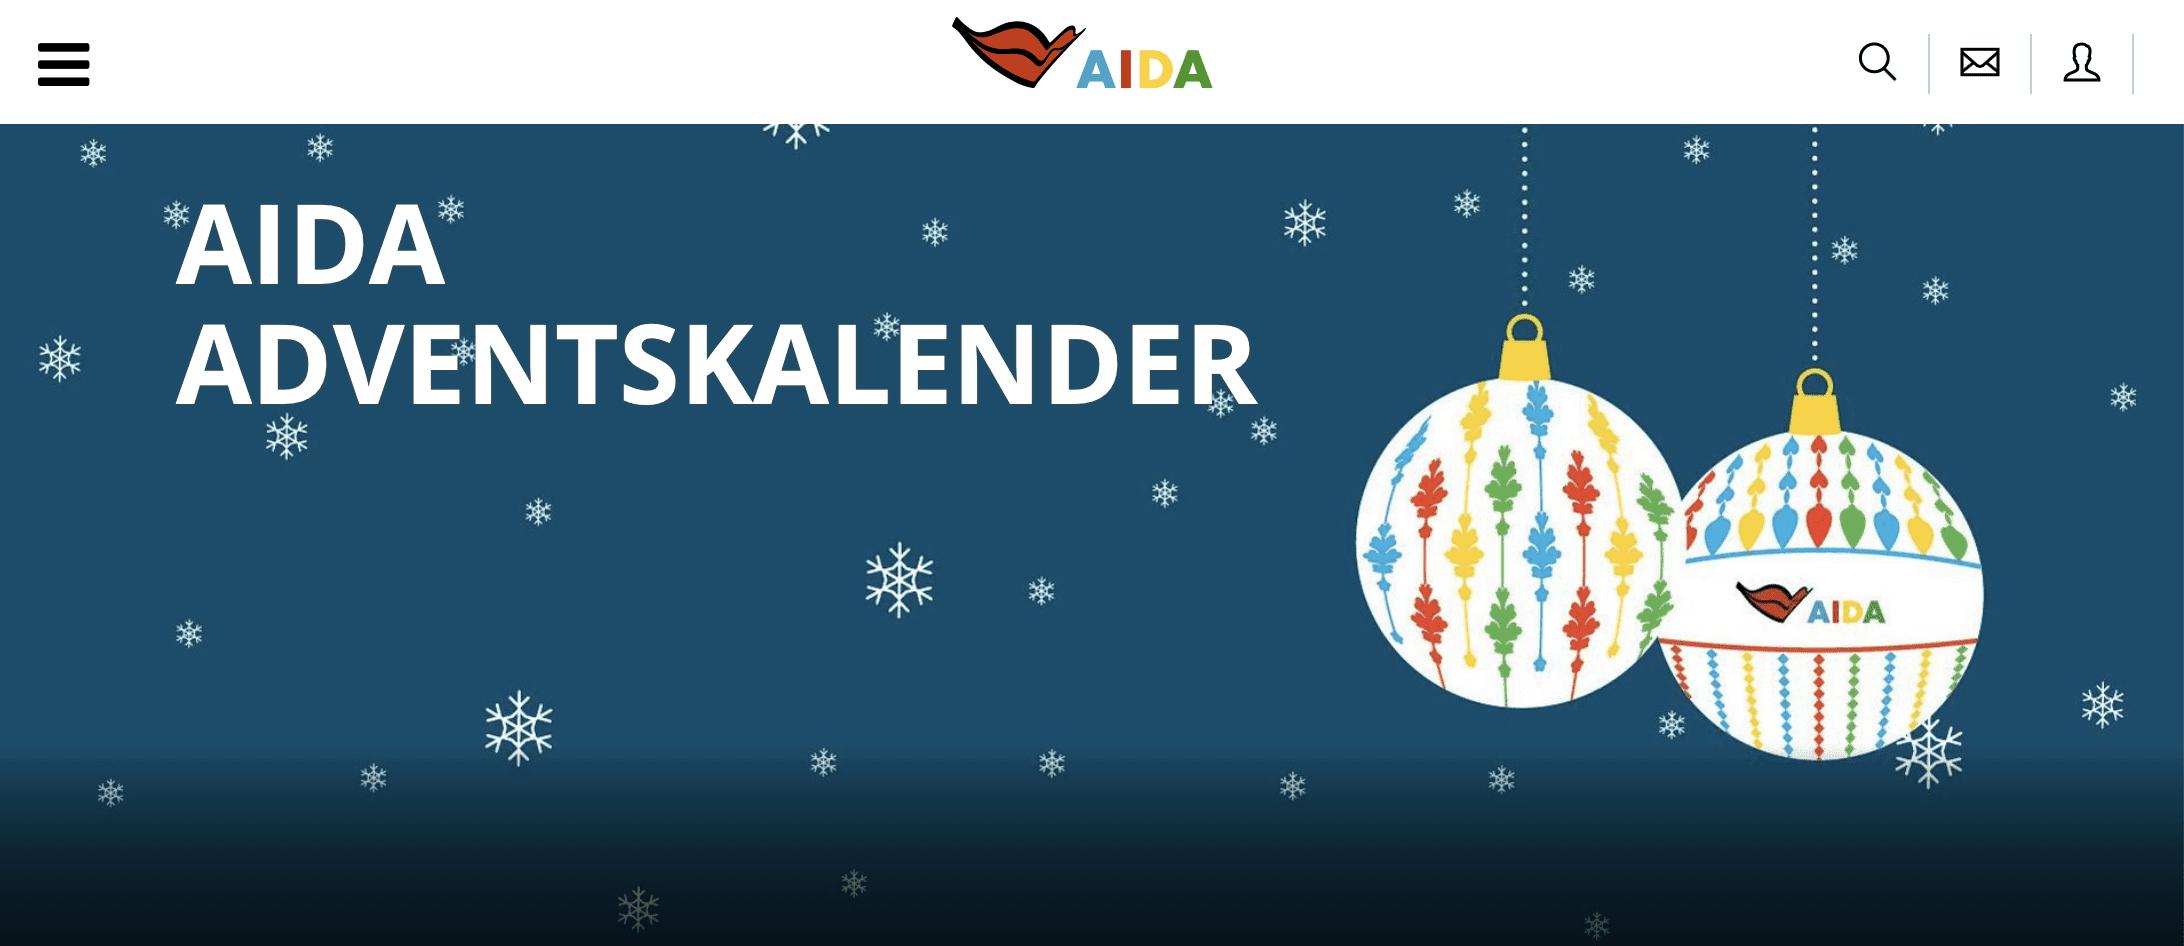 AIDA Adventskalender-Gewinnspiel